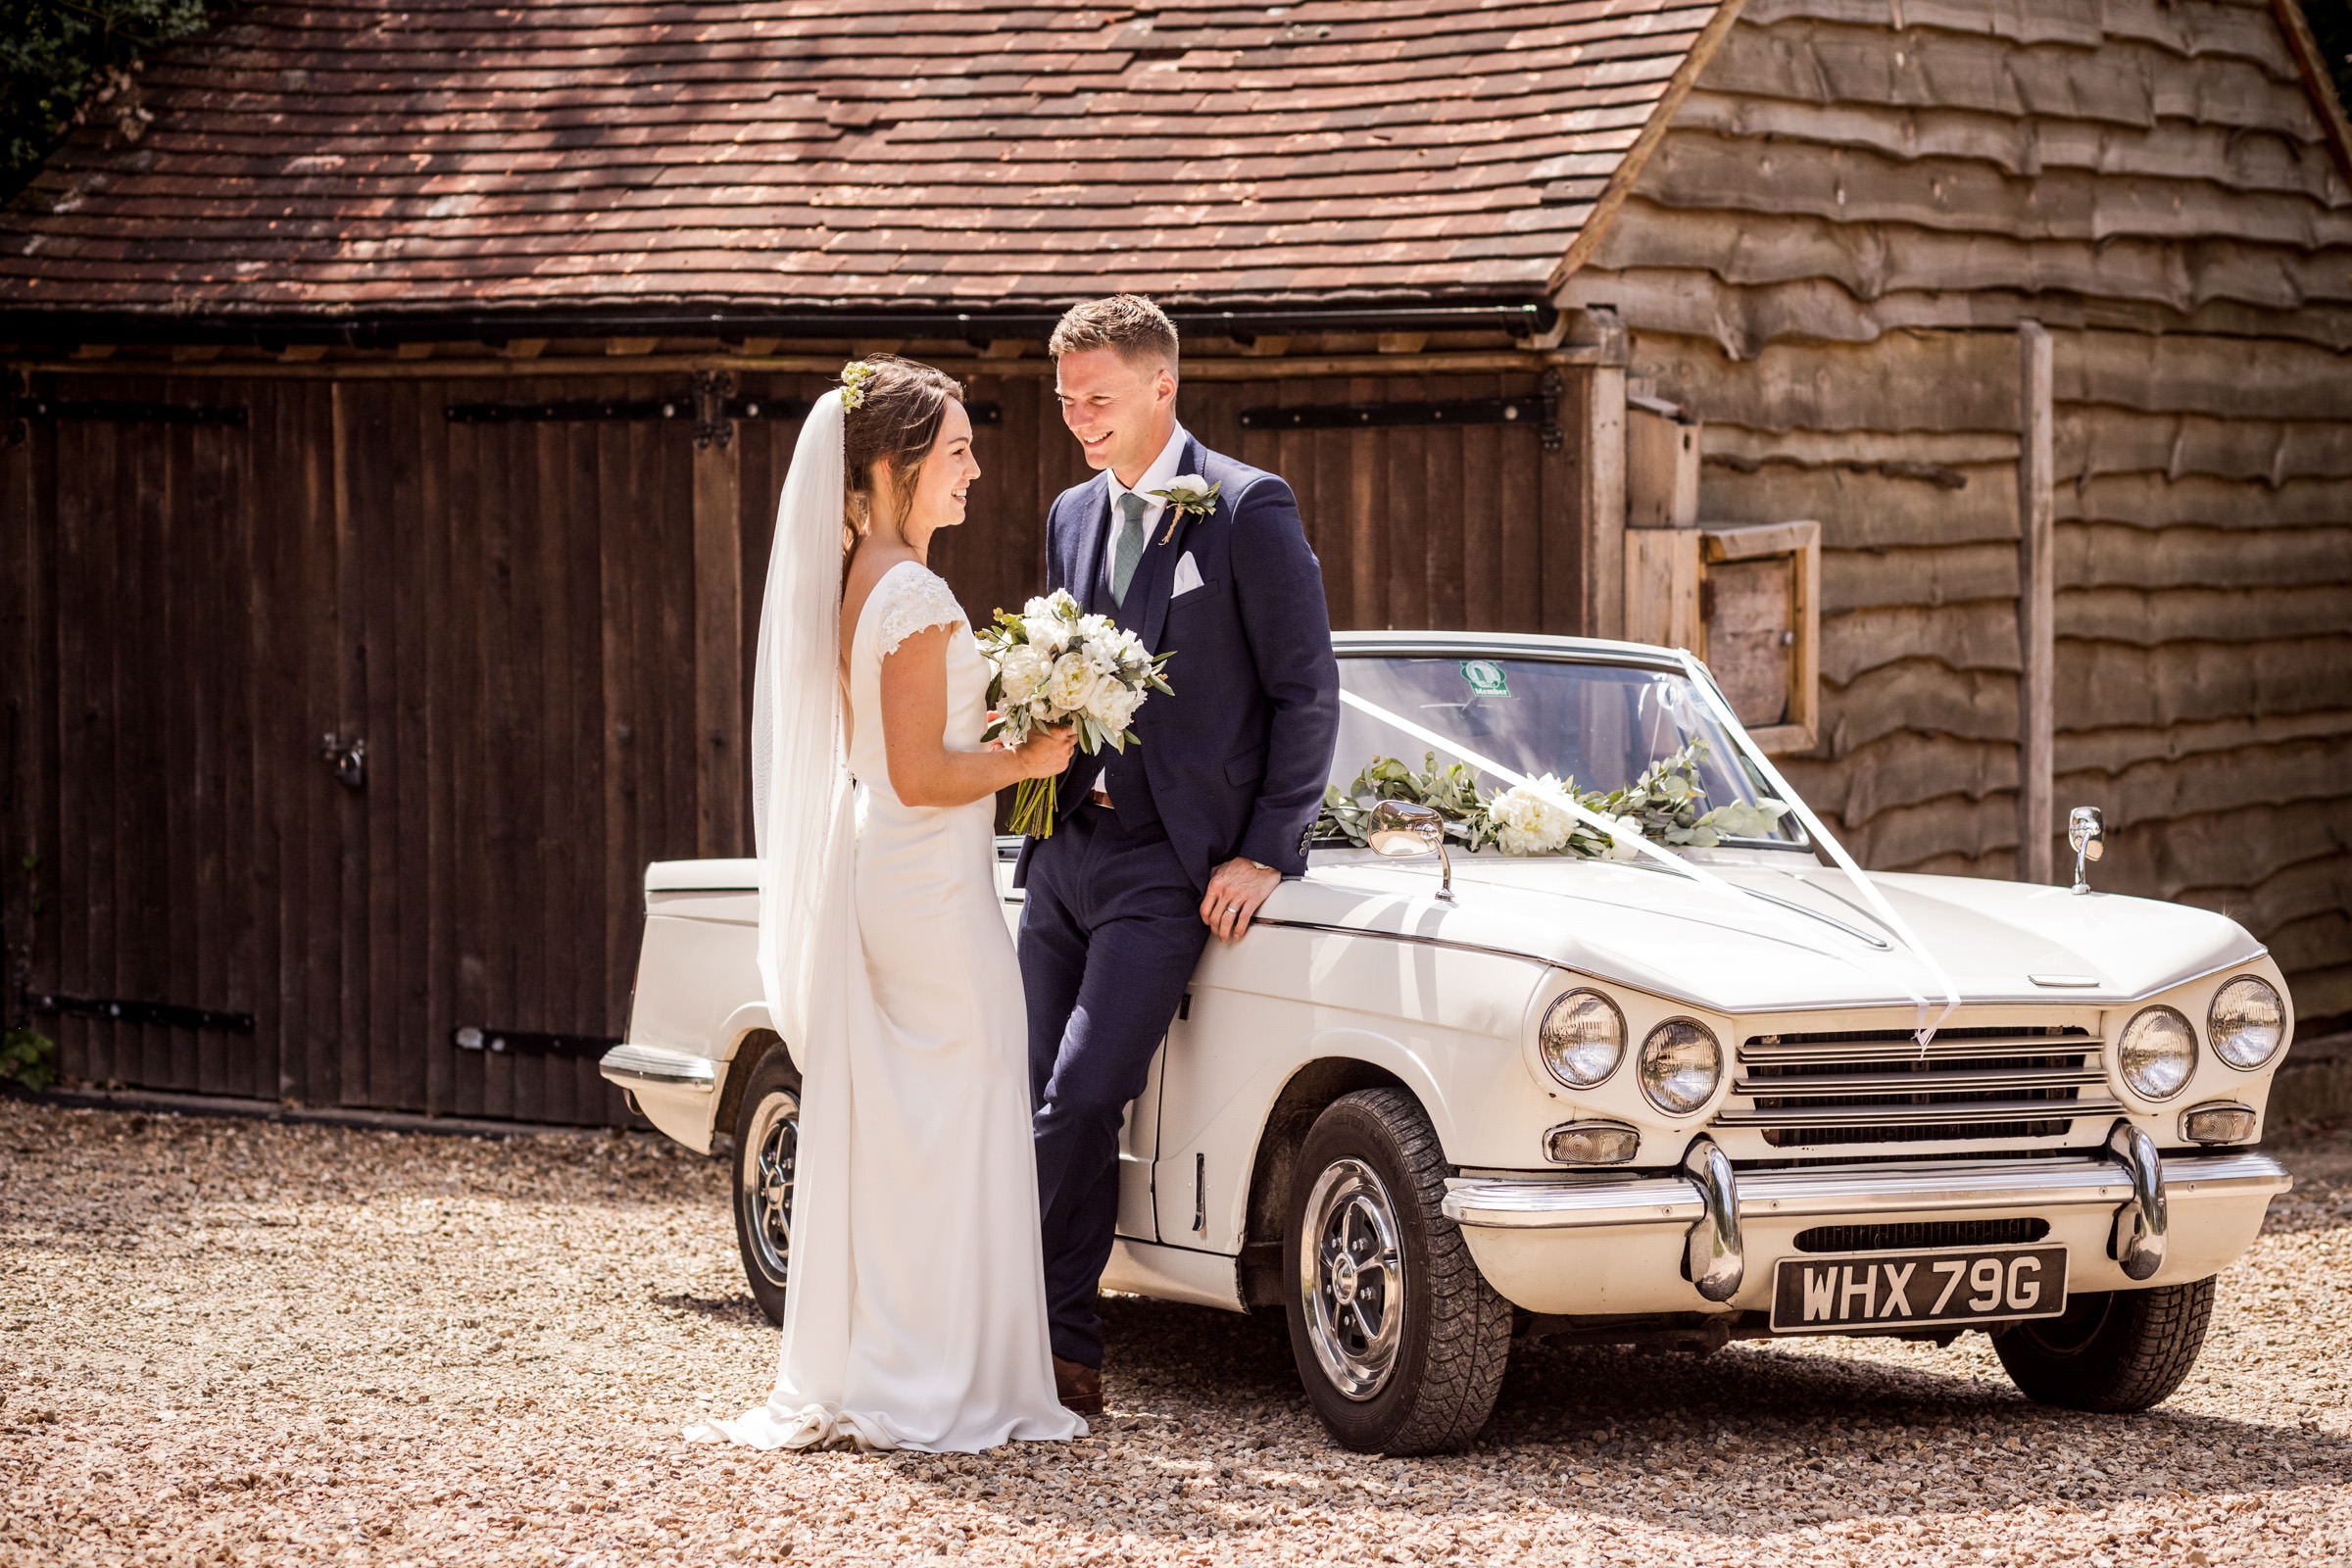 Wedding Photography in Ewshot Surrey 020.jpg